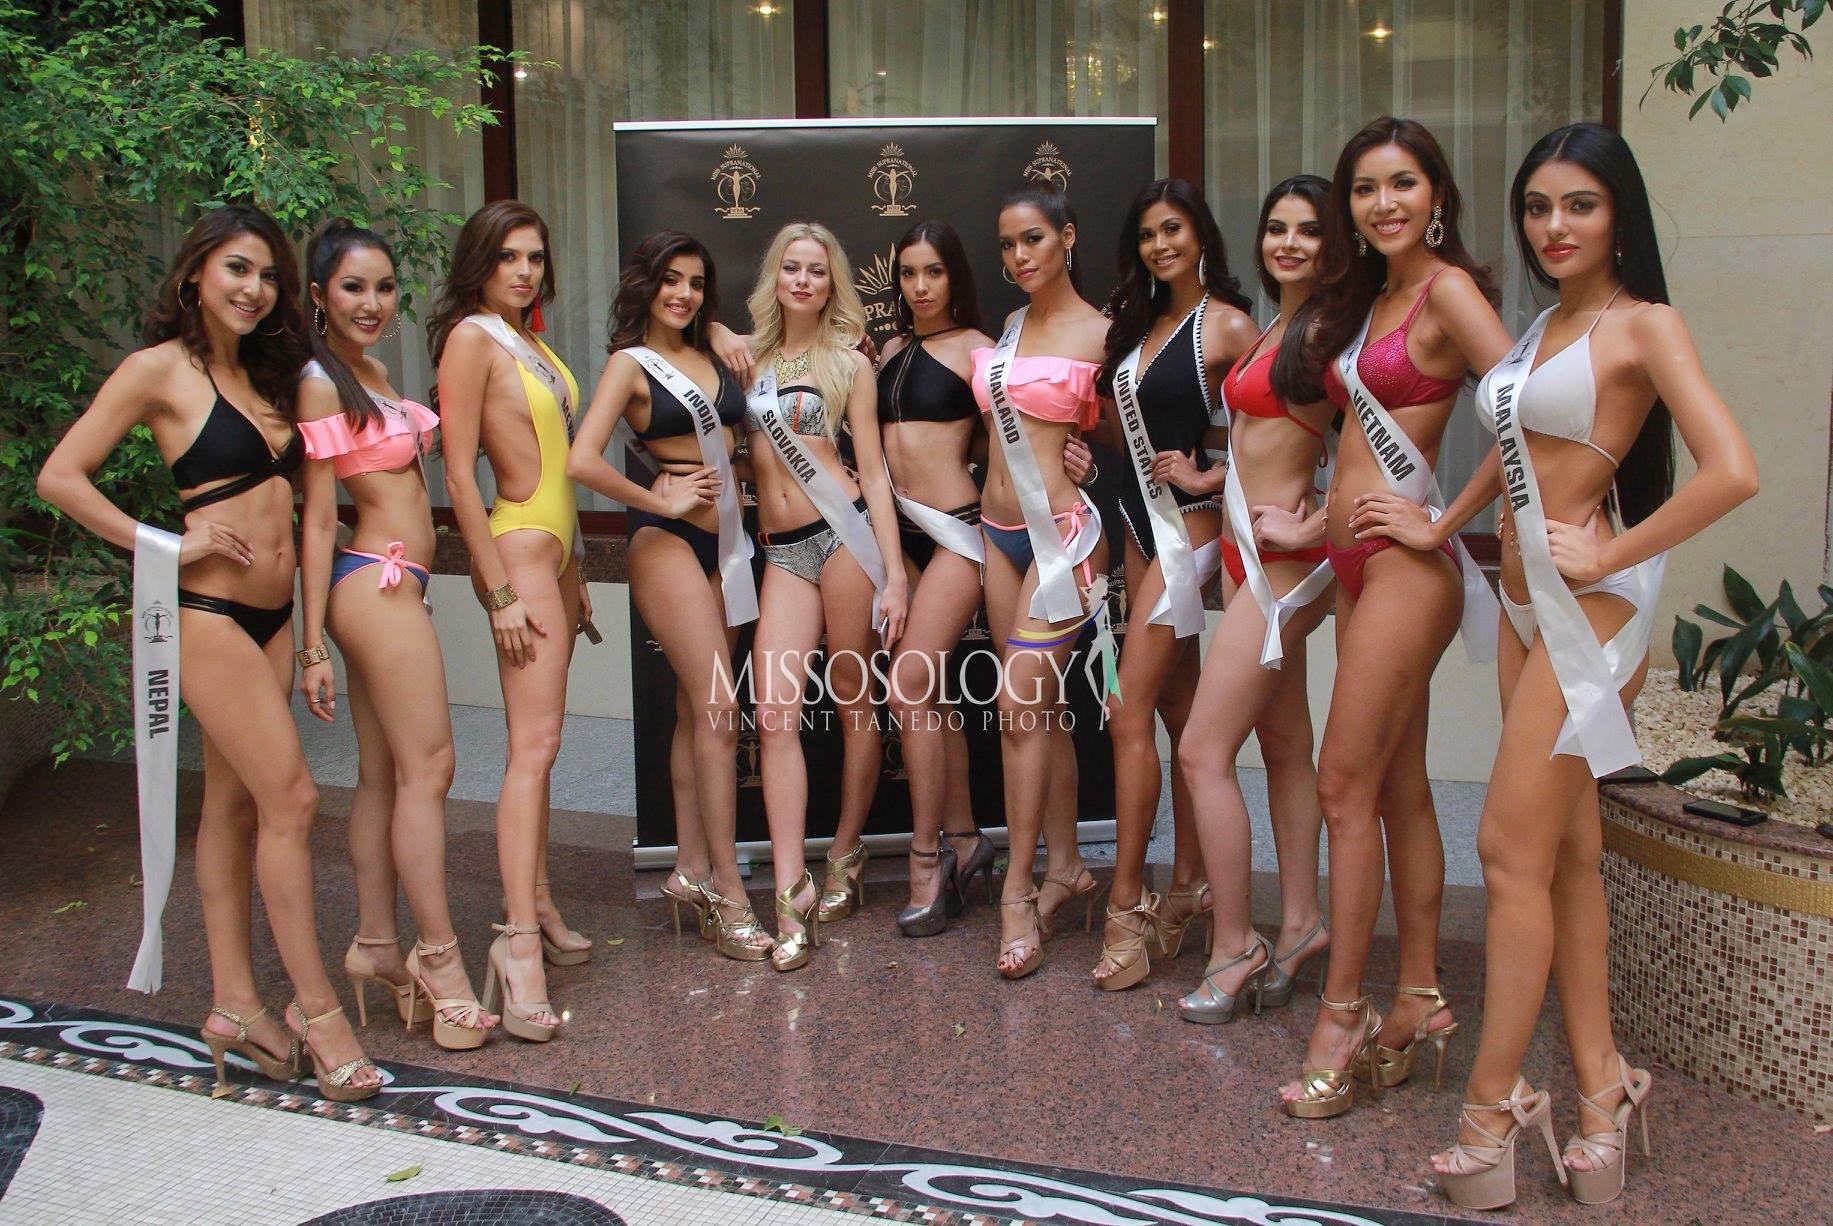 Minh Tu bikini show 0% body fat allowed remember the image of childhood Pham Huong - Photo 6.